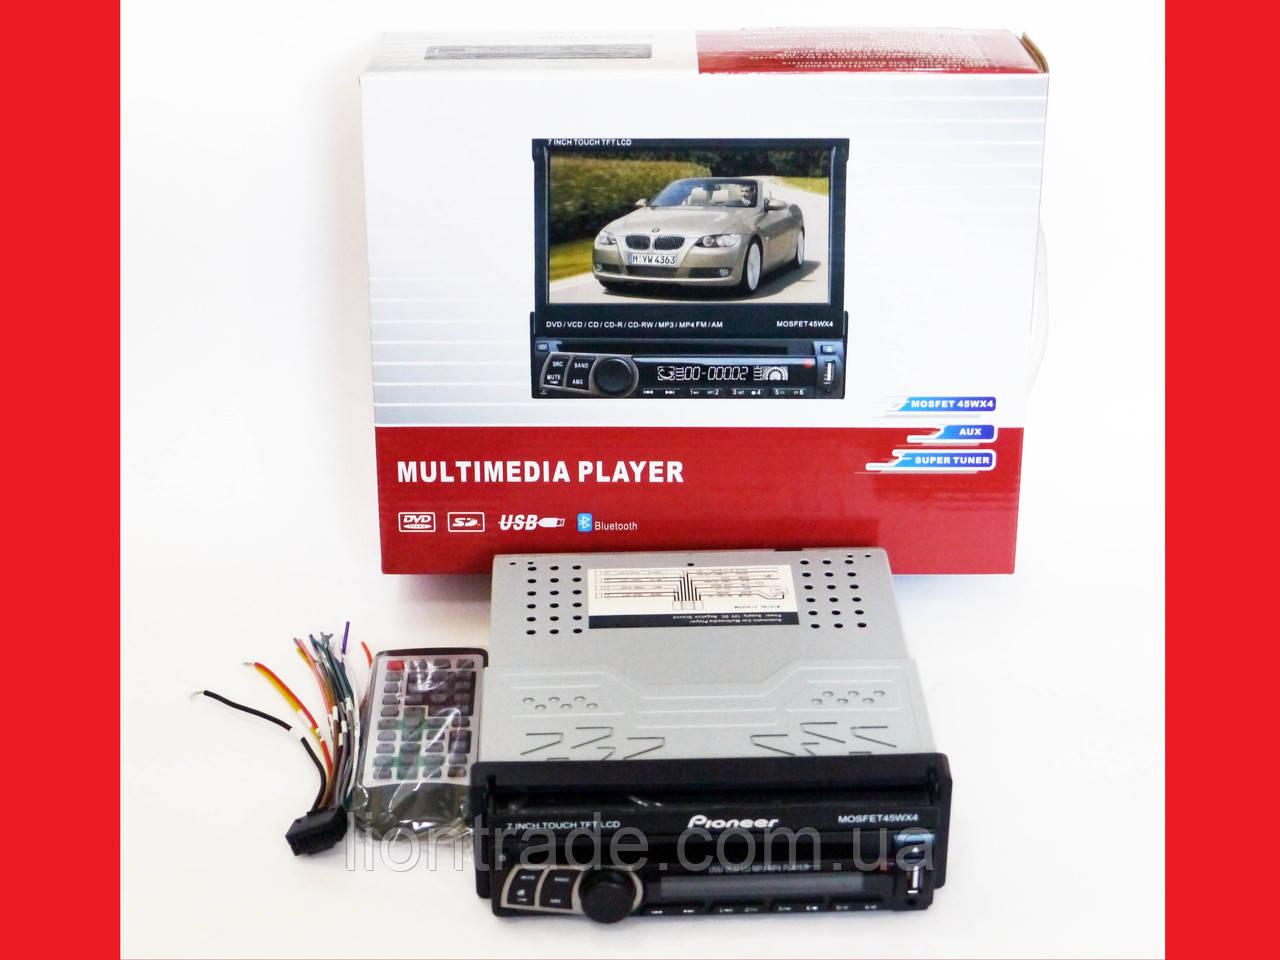 1din Магнитола Pioneer 712 USB + DVD + Bluetooth